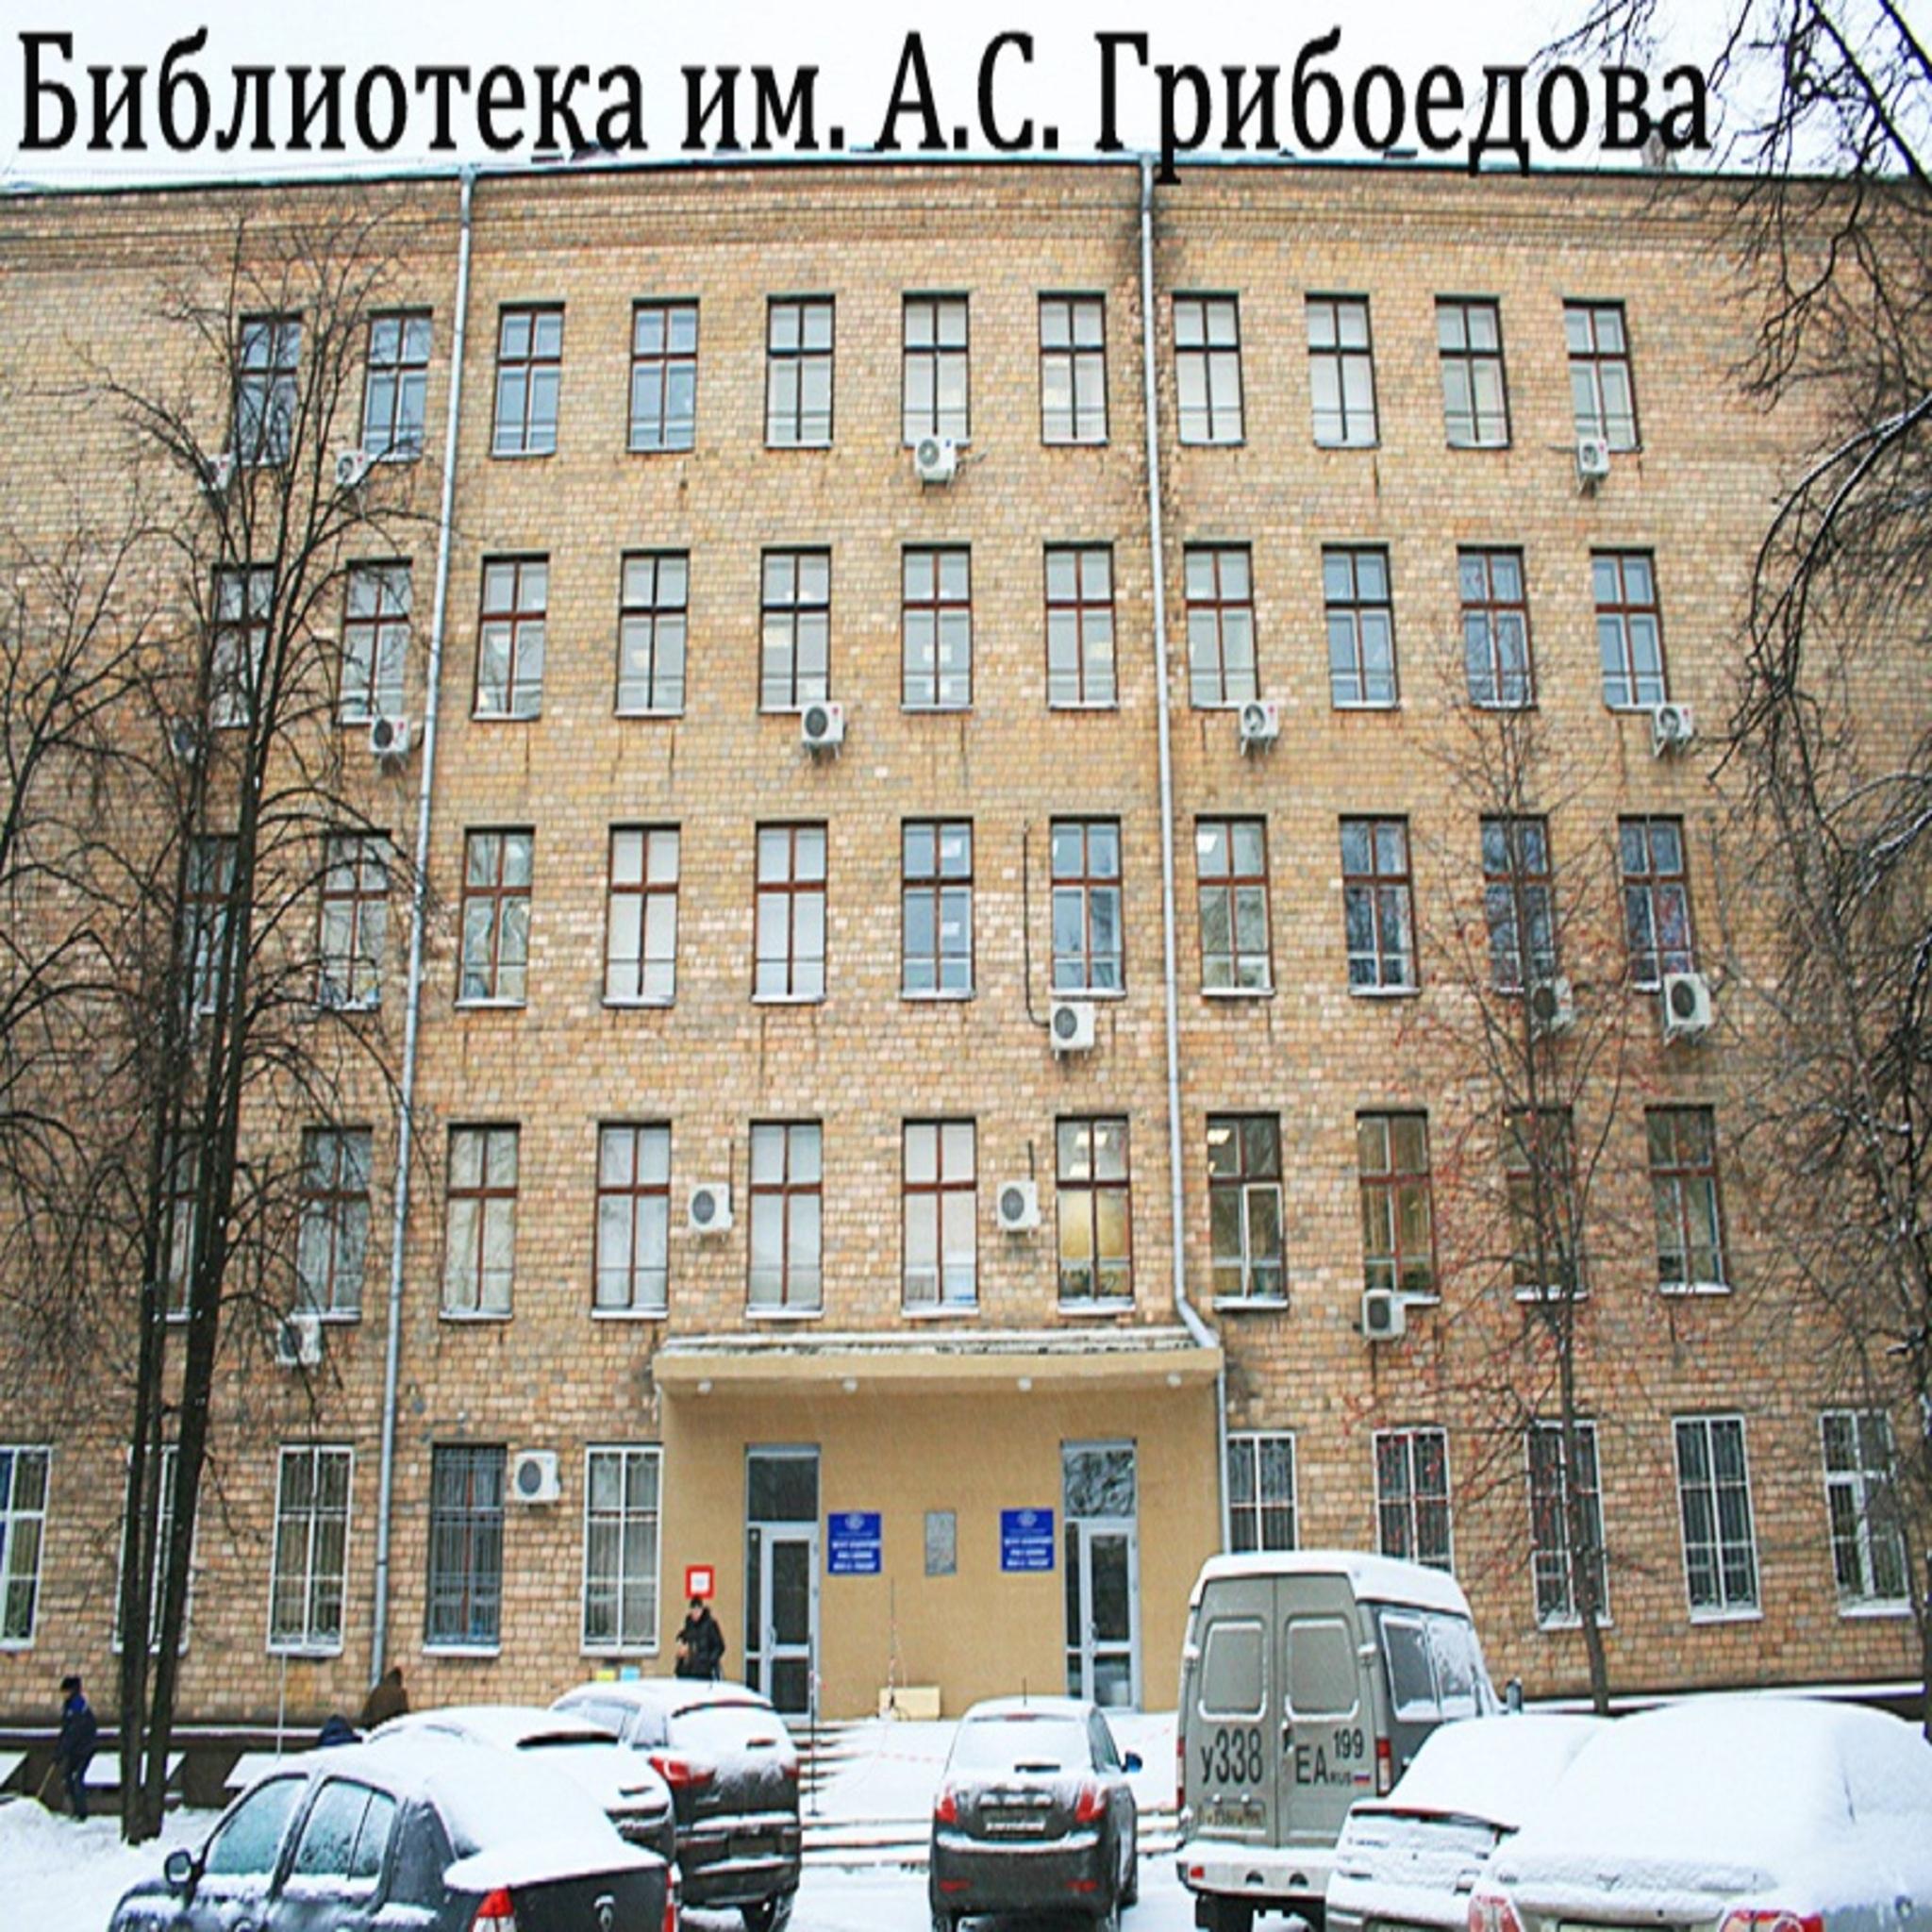 Библиотека им. А.С. Грибоедова